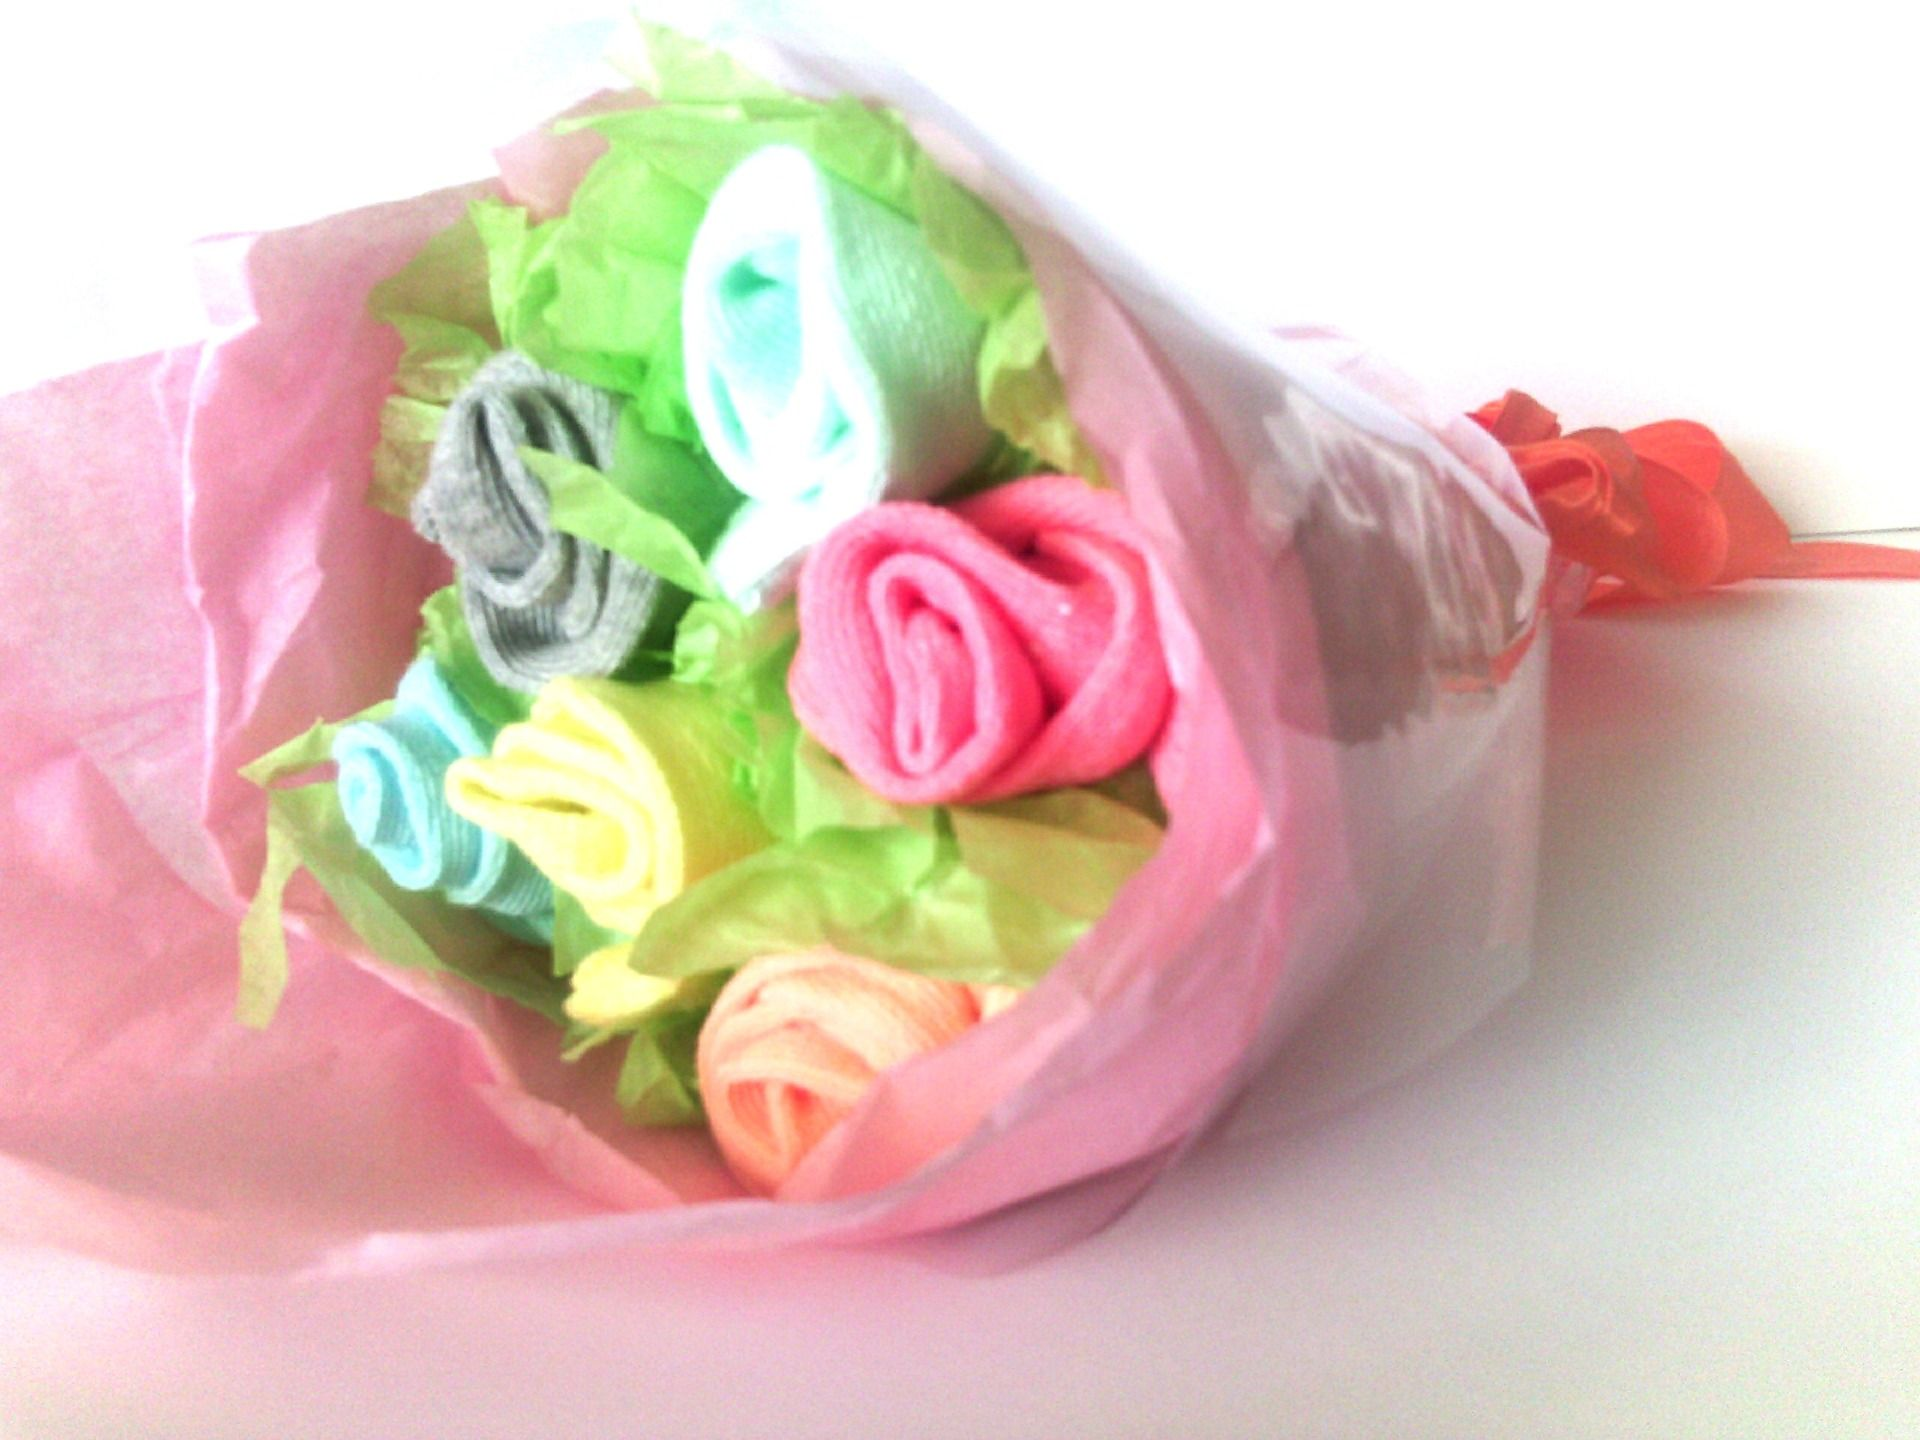 Cadeau Rigolo Baby Shower cadeau de naissance original - babyshower bouquet de fleurs